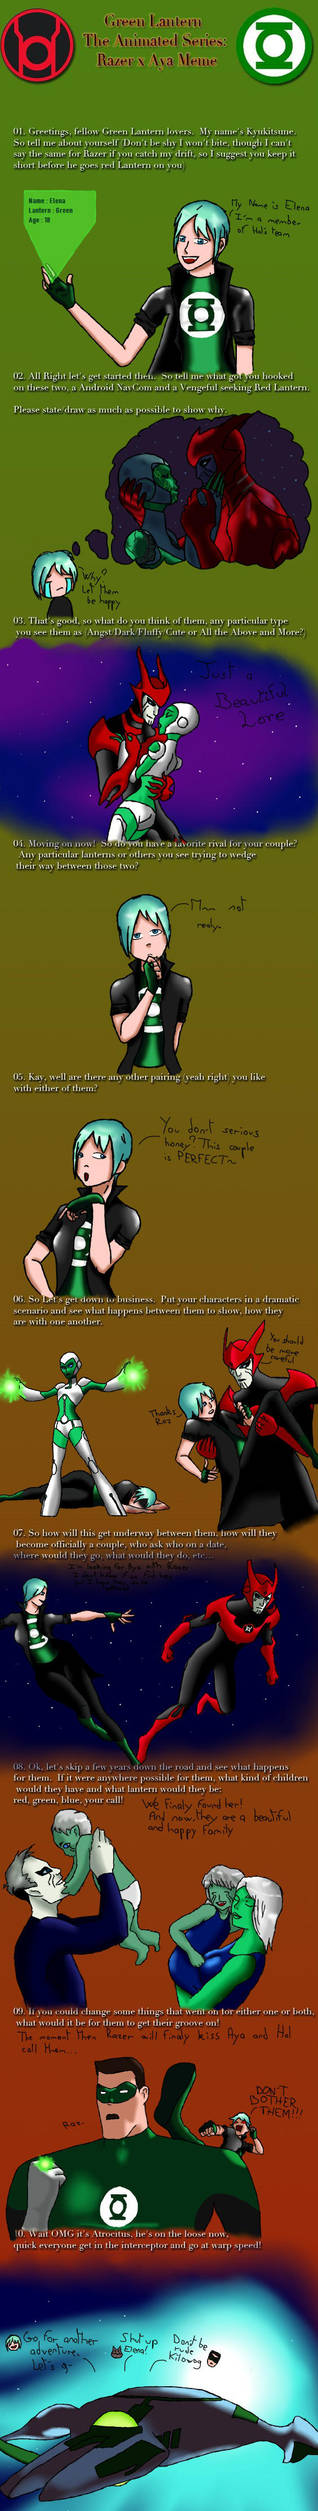 Green Lantern, the animated series : Oc Meme by Edeliou